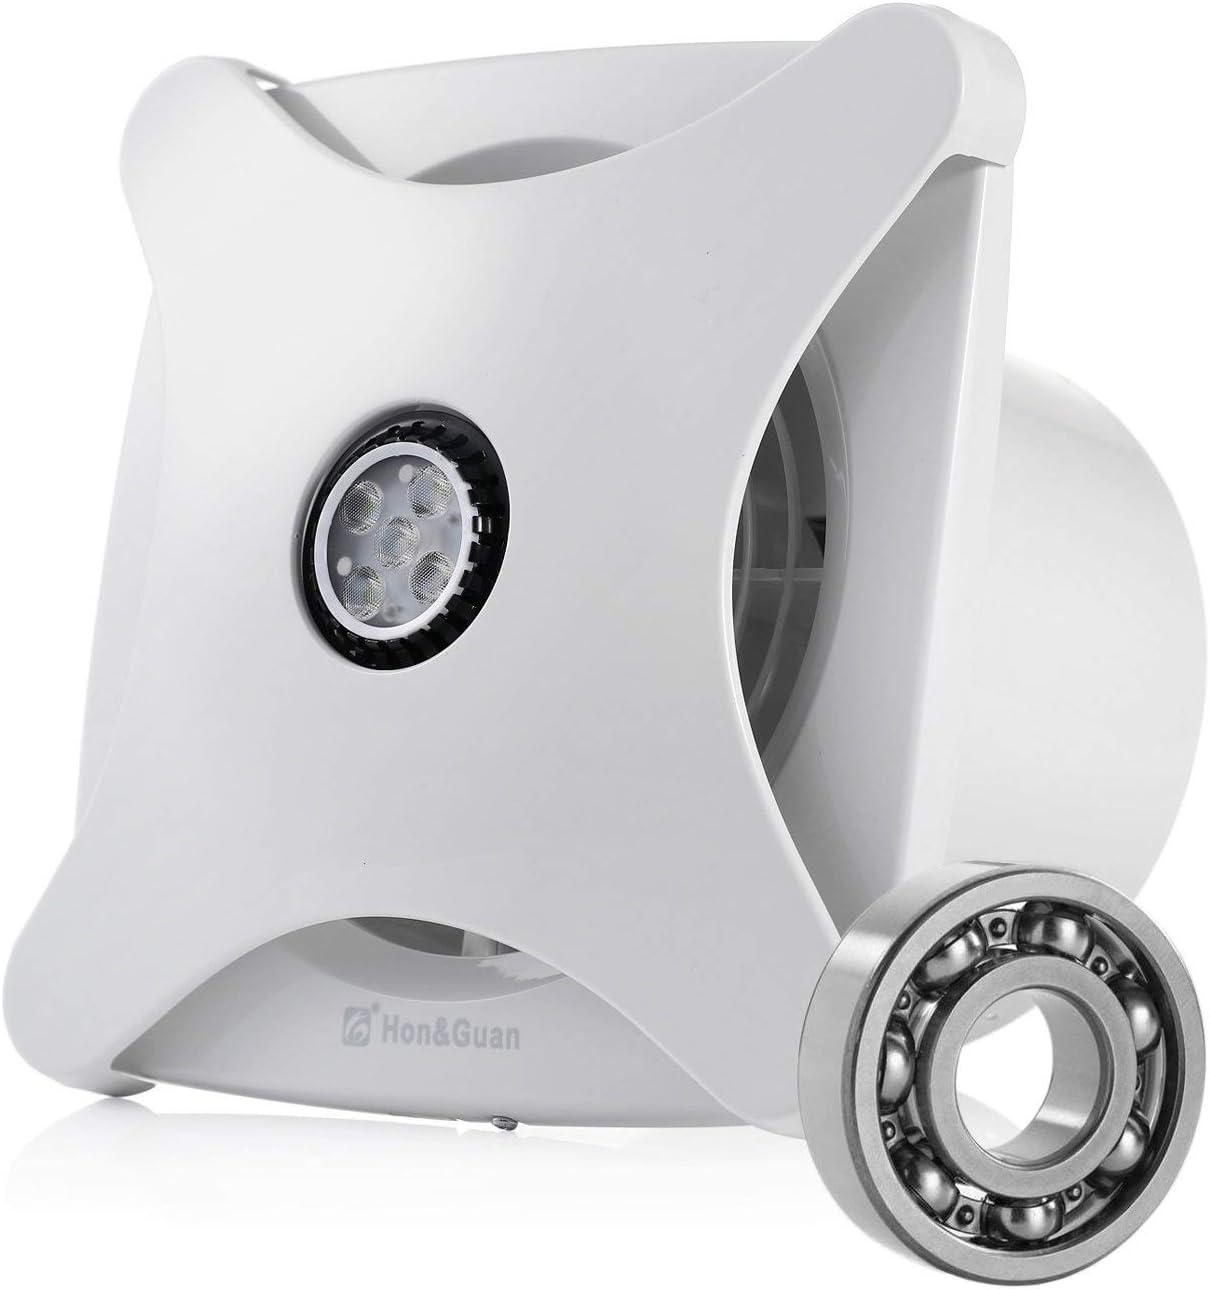 Hon&Guan 150mm Ventilador Extractor de Aire Silencioso 197m³/h para Oficina, Baño, Dormitorio